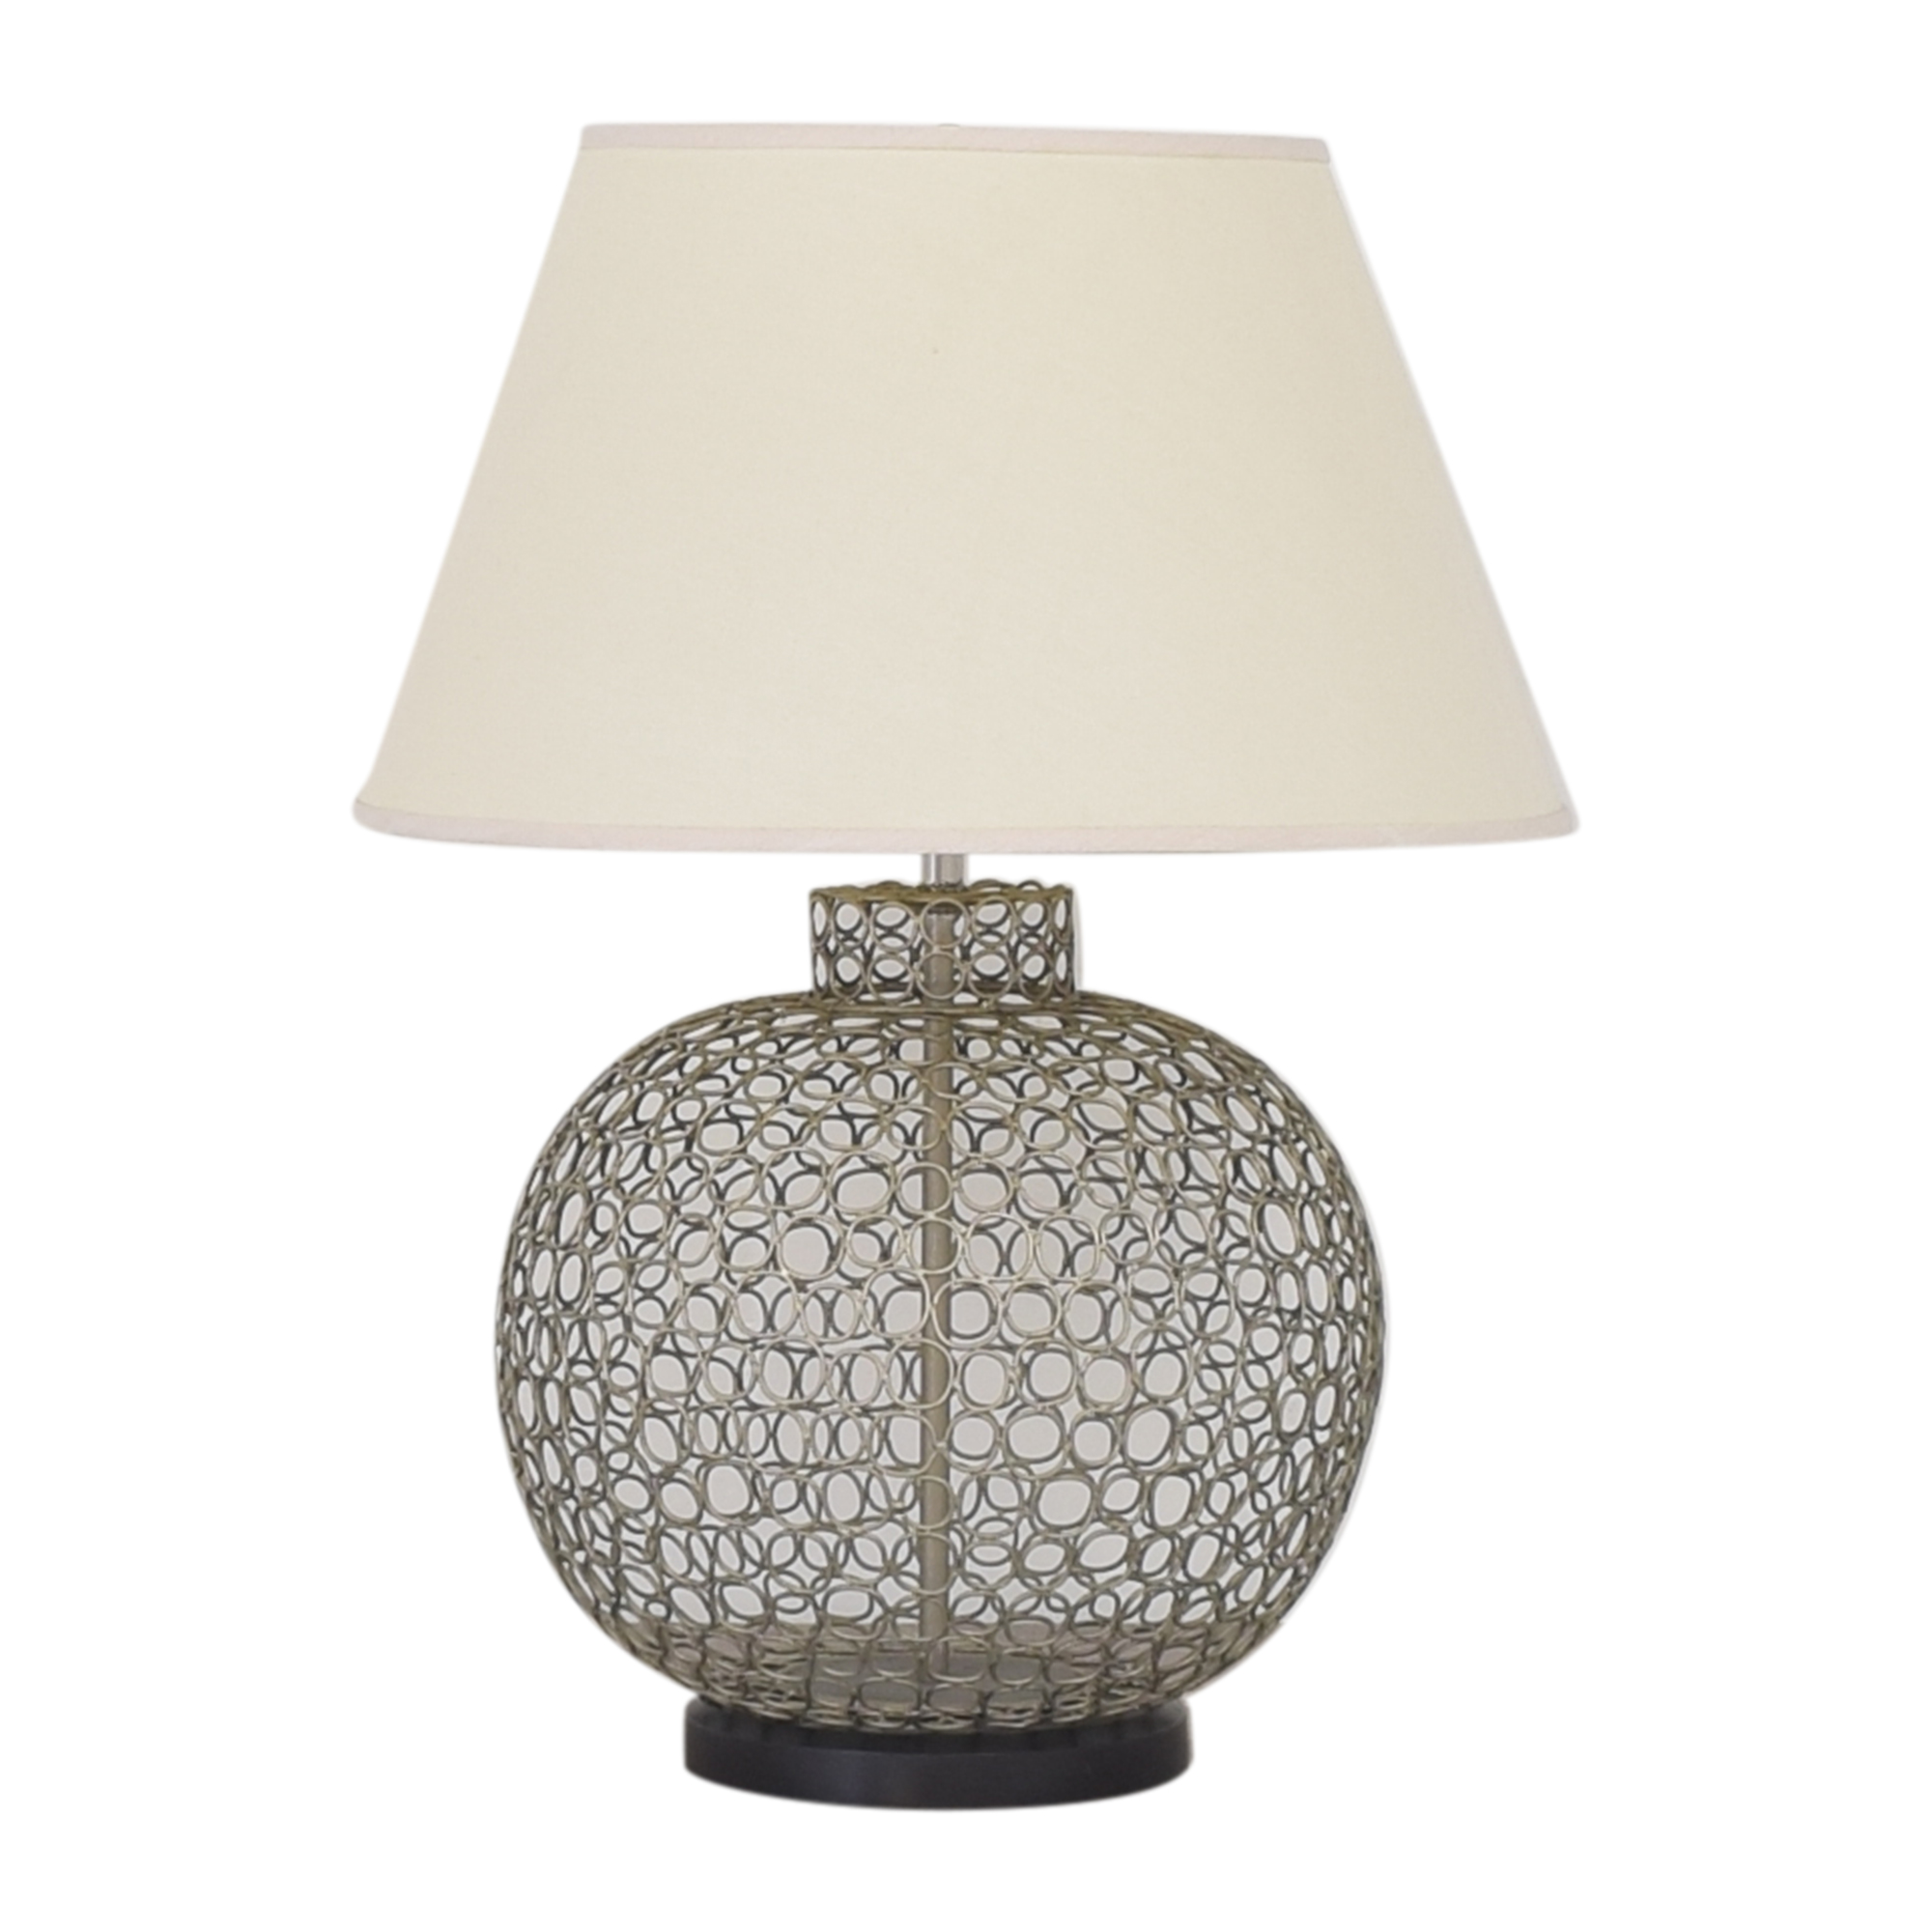 Ethan Allen Ethan Allen Openweave Nickel Table Lamp dimensions